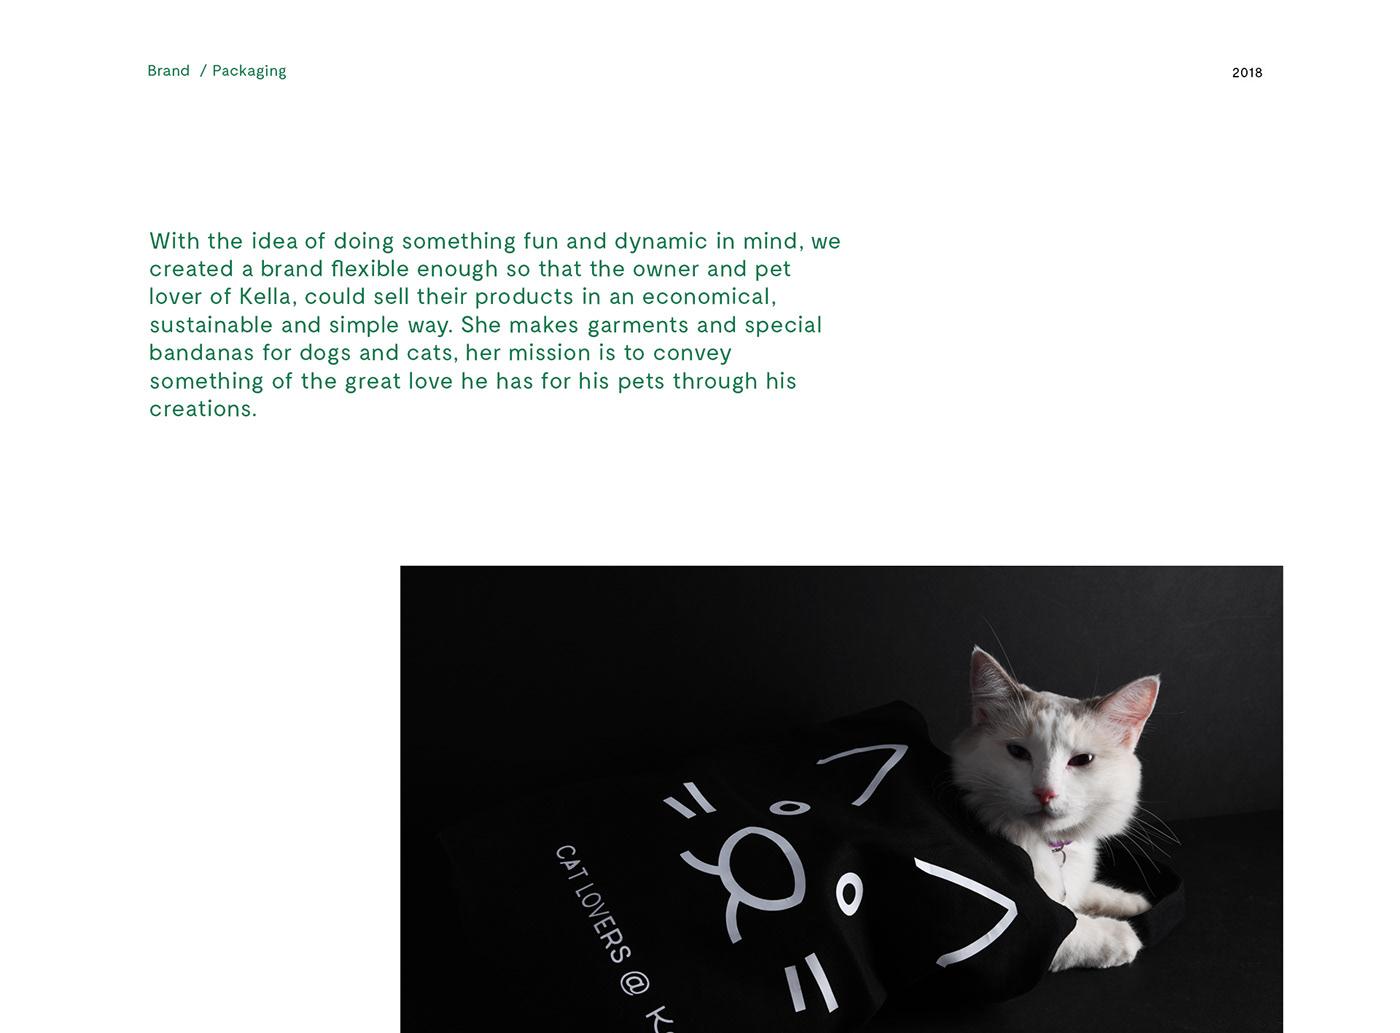 pets mexico handmade perritos Clothing Fashion  green cats